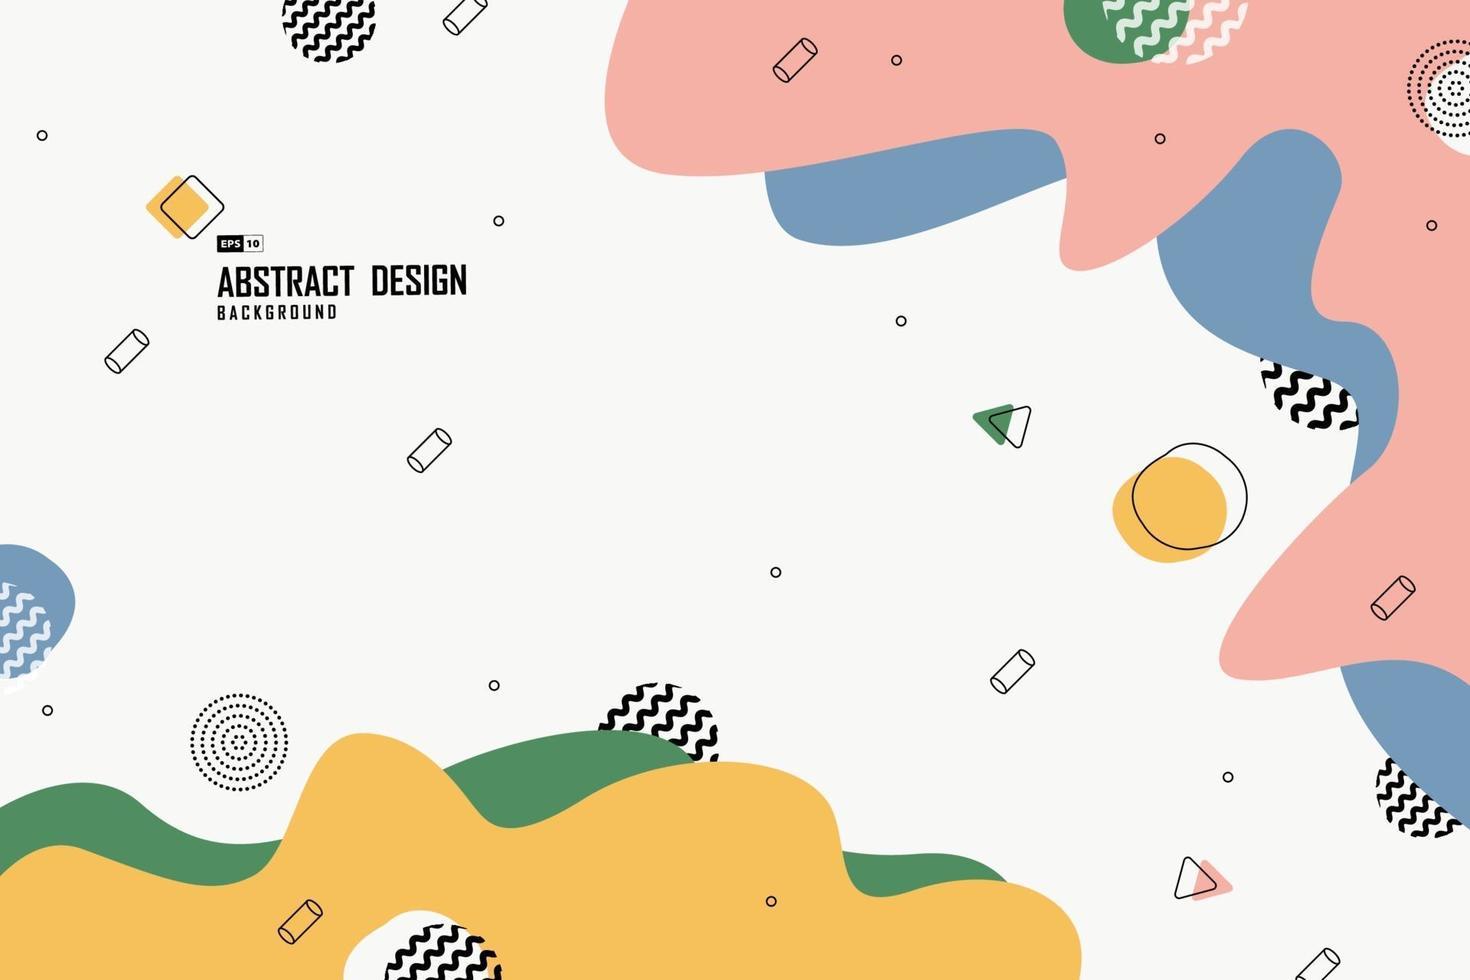 abstrakt memphis mönster av minimal design konstverk bakgrund. illustration vektor eps10